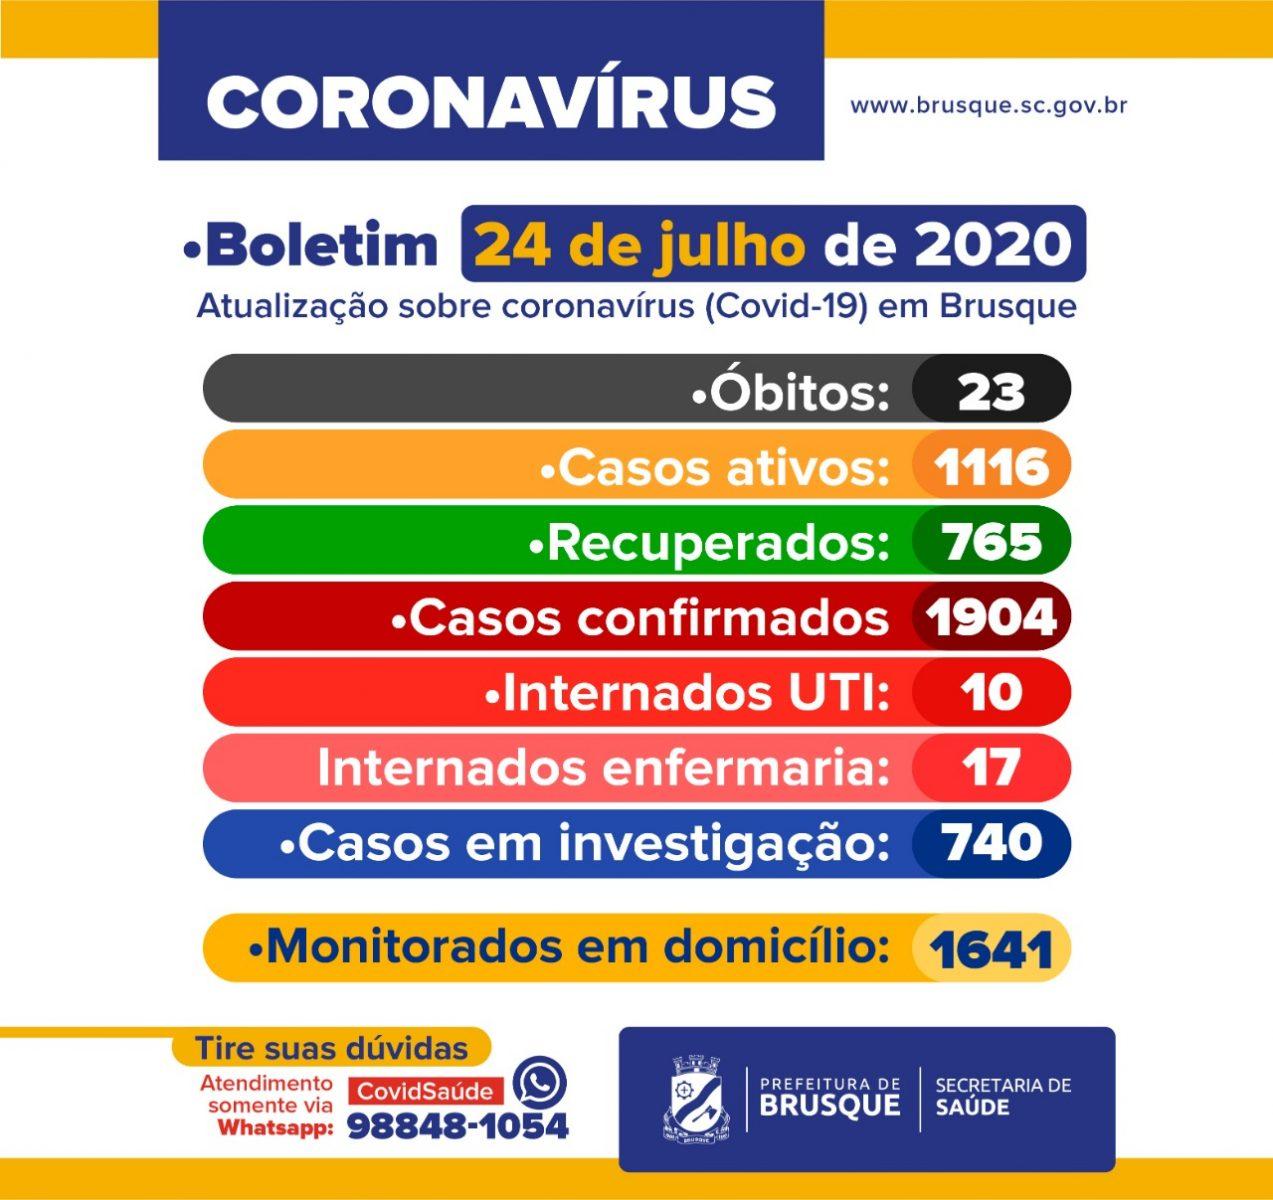 Confira o boletim epidemiológico da Prefeitura de Brusque nesta sexta-feira (24)